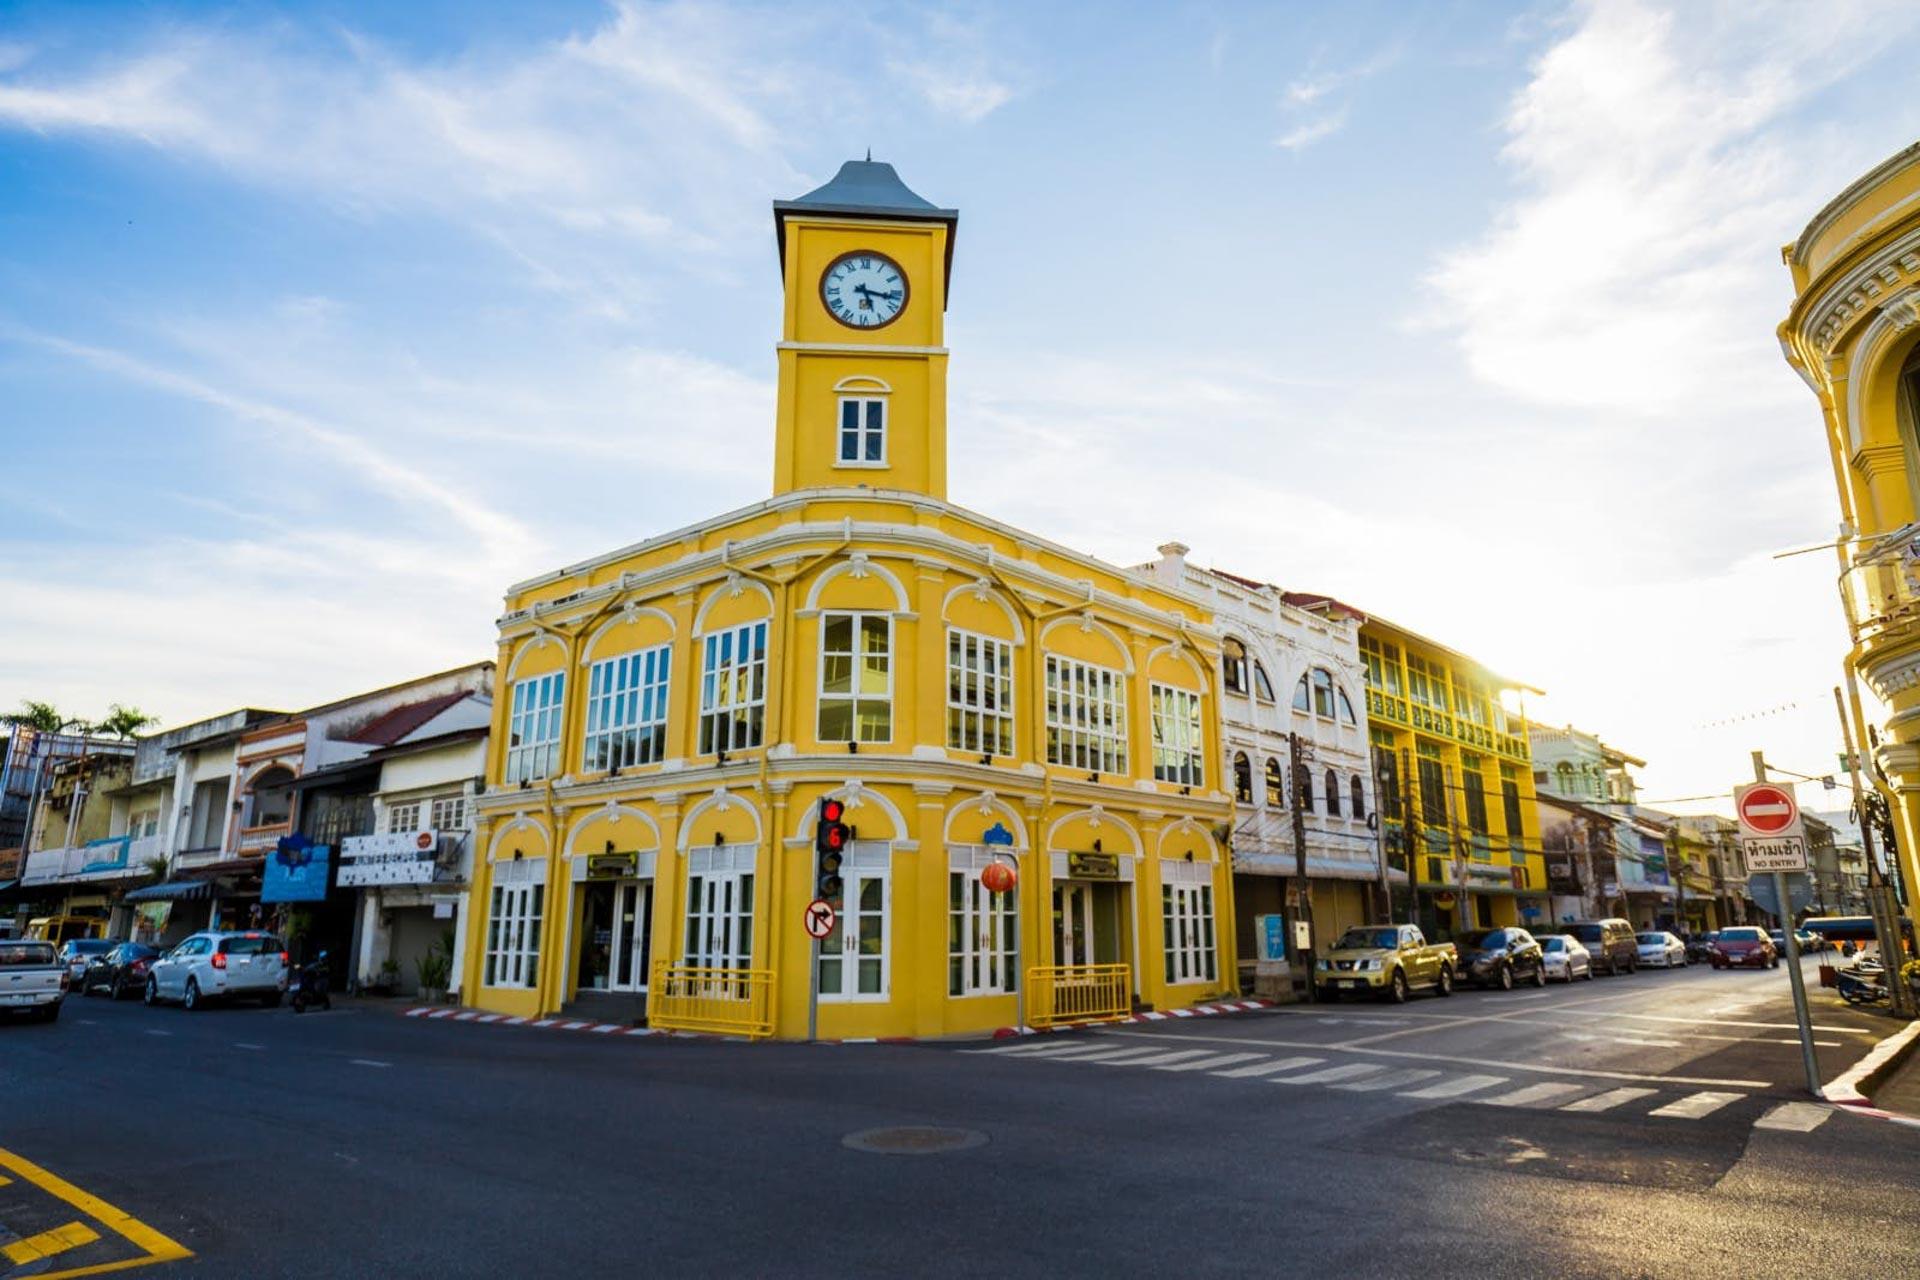 Phuket Town / Picture by Ruslan Kalnitsky - Shutterstock